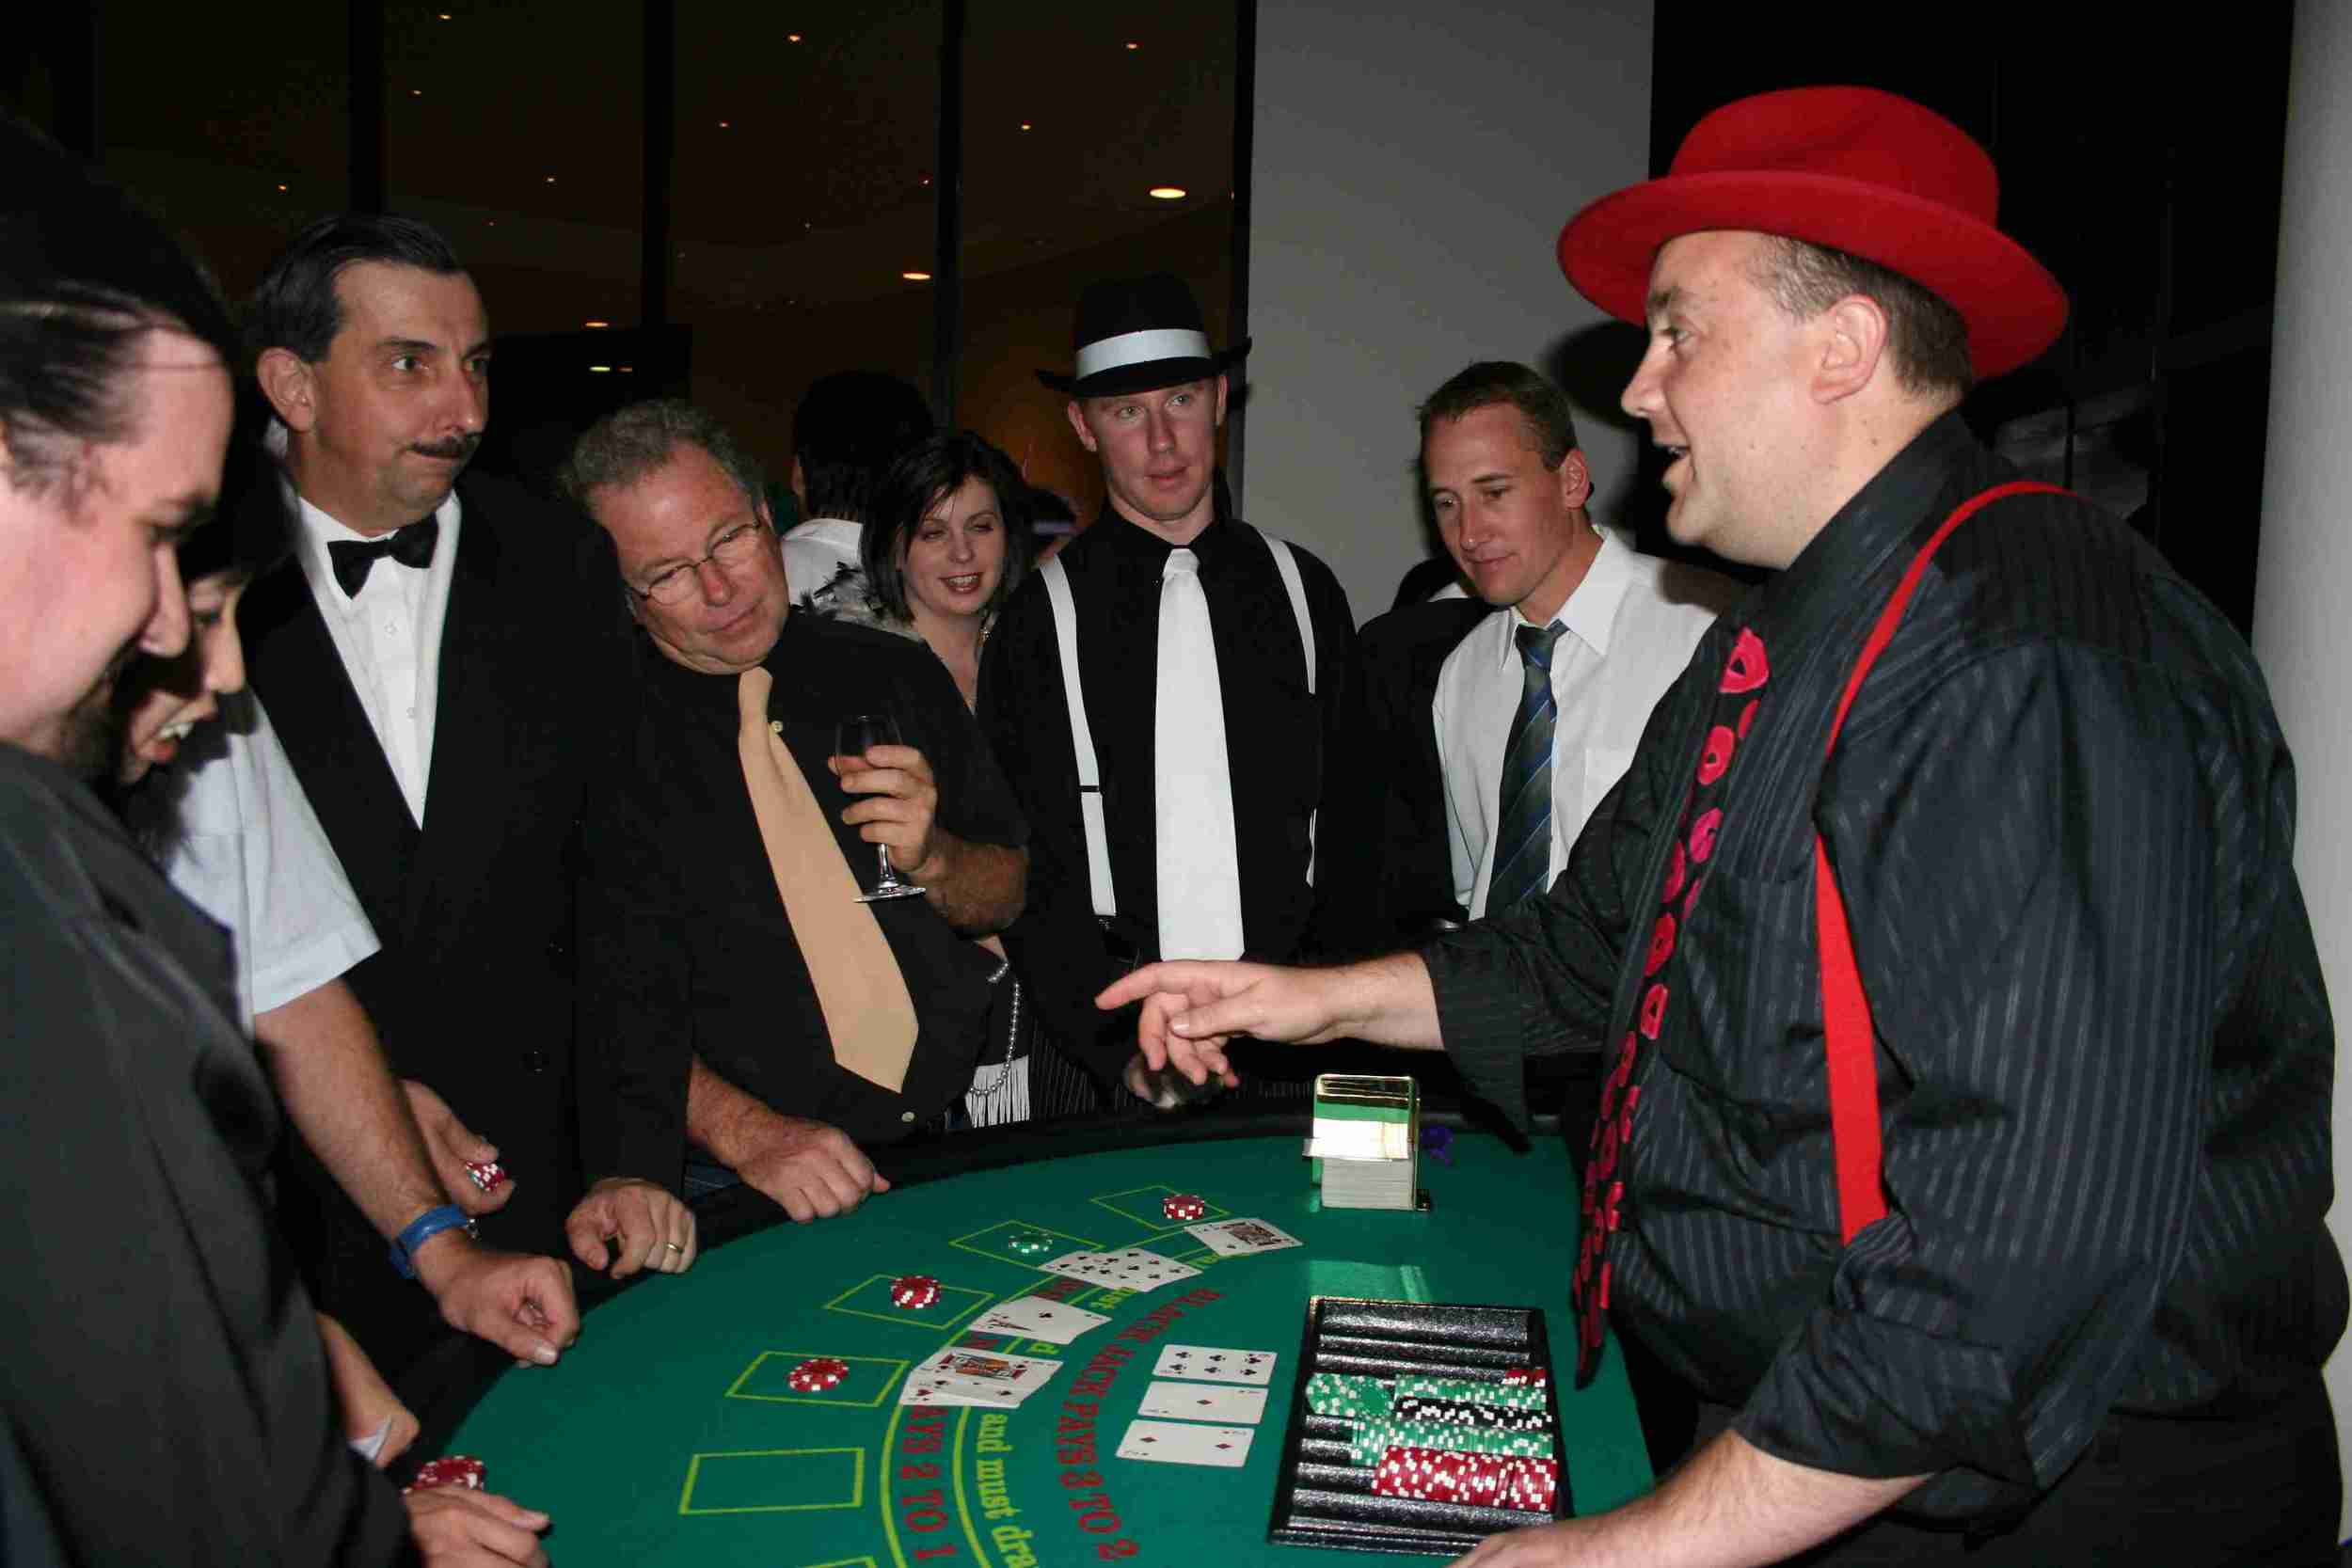 casinonights1.jpg